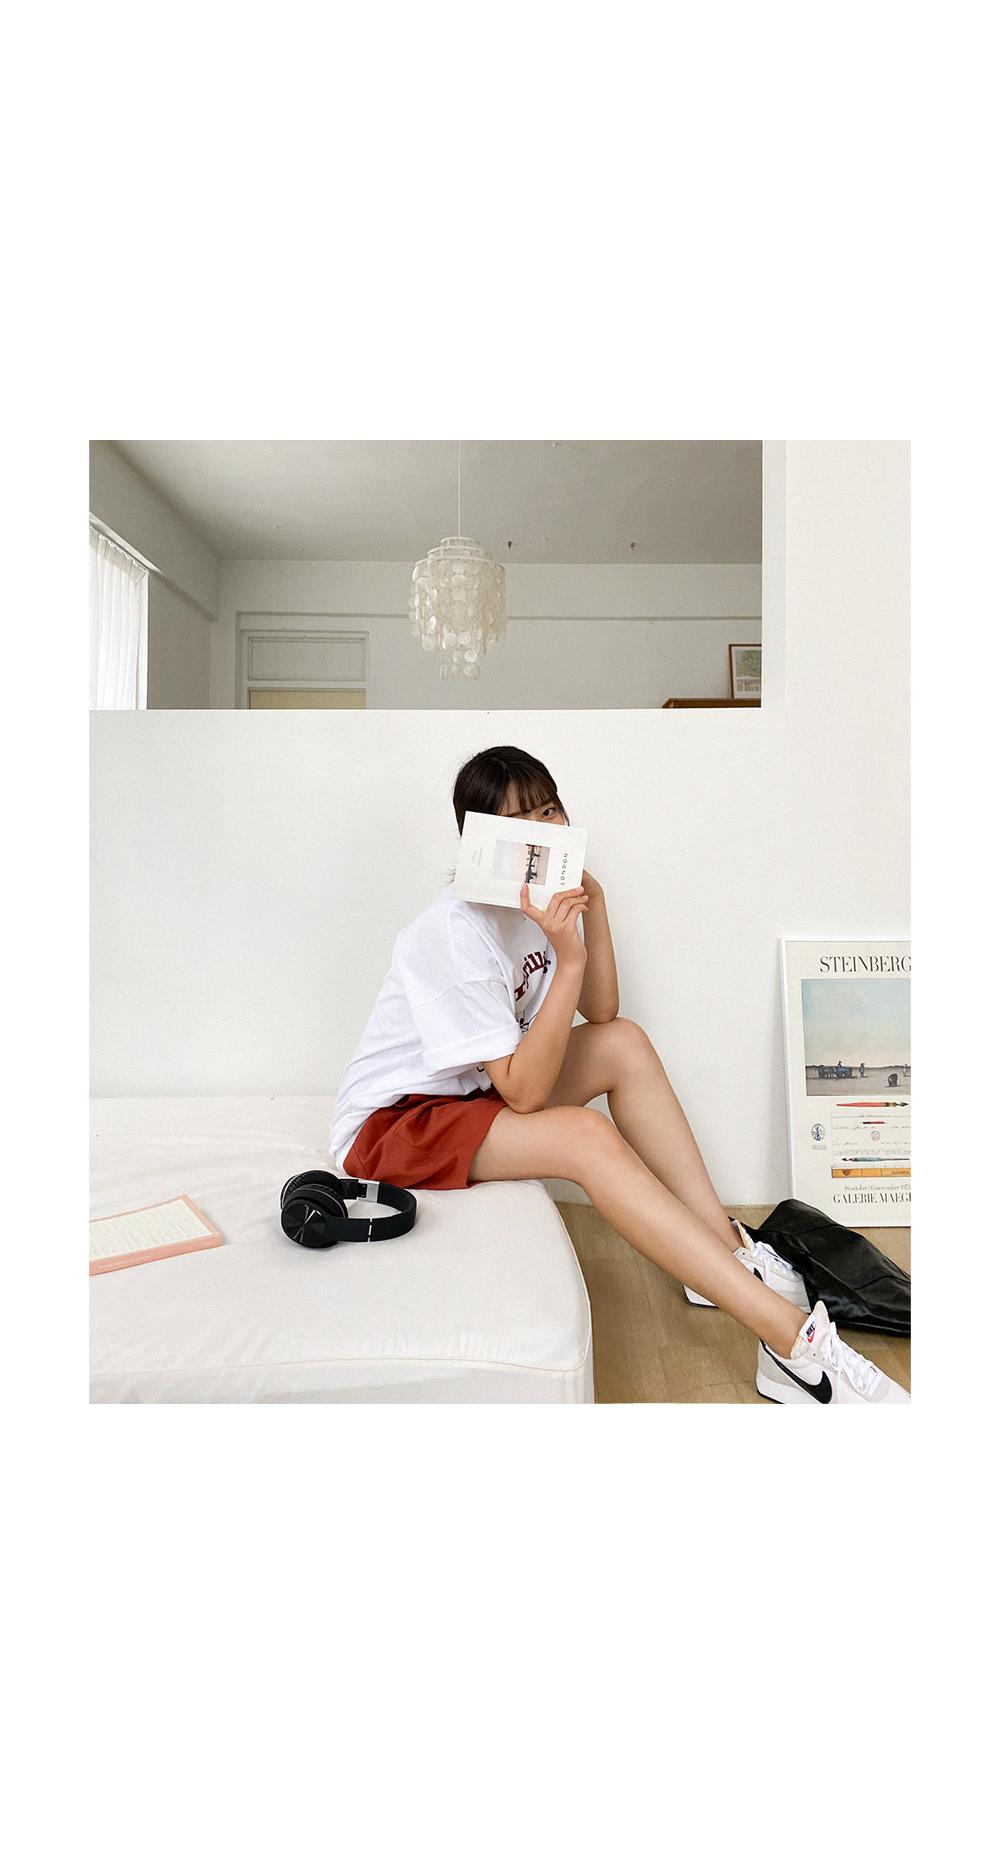 Big Size 55-120 Reading Overfit Short Sleeve T-shirt